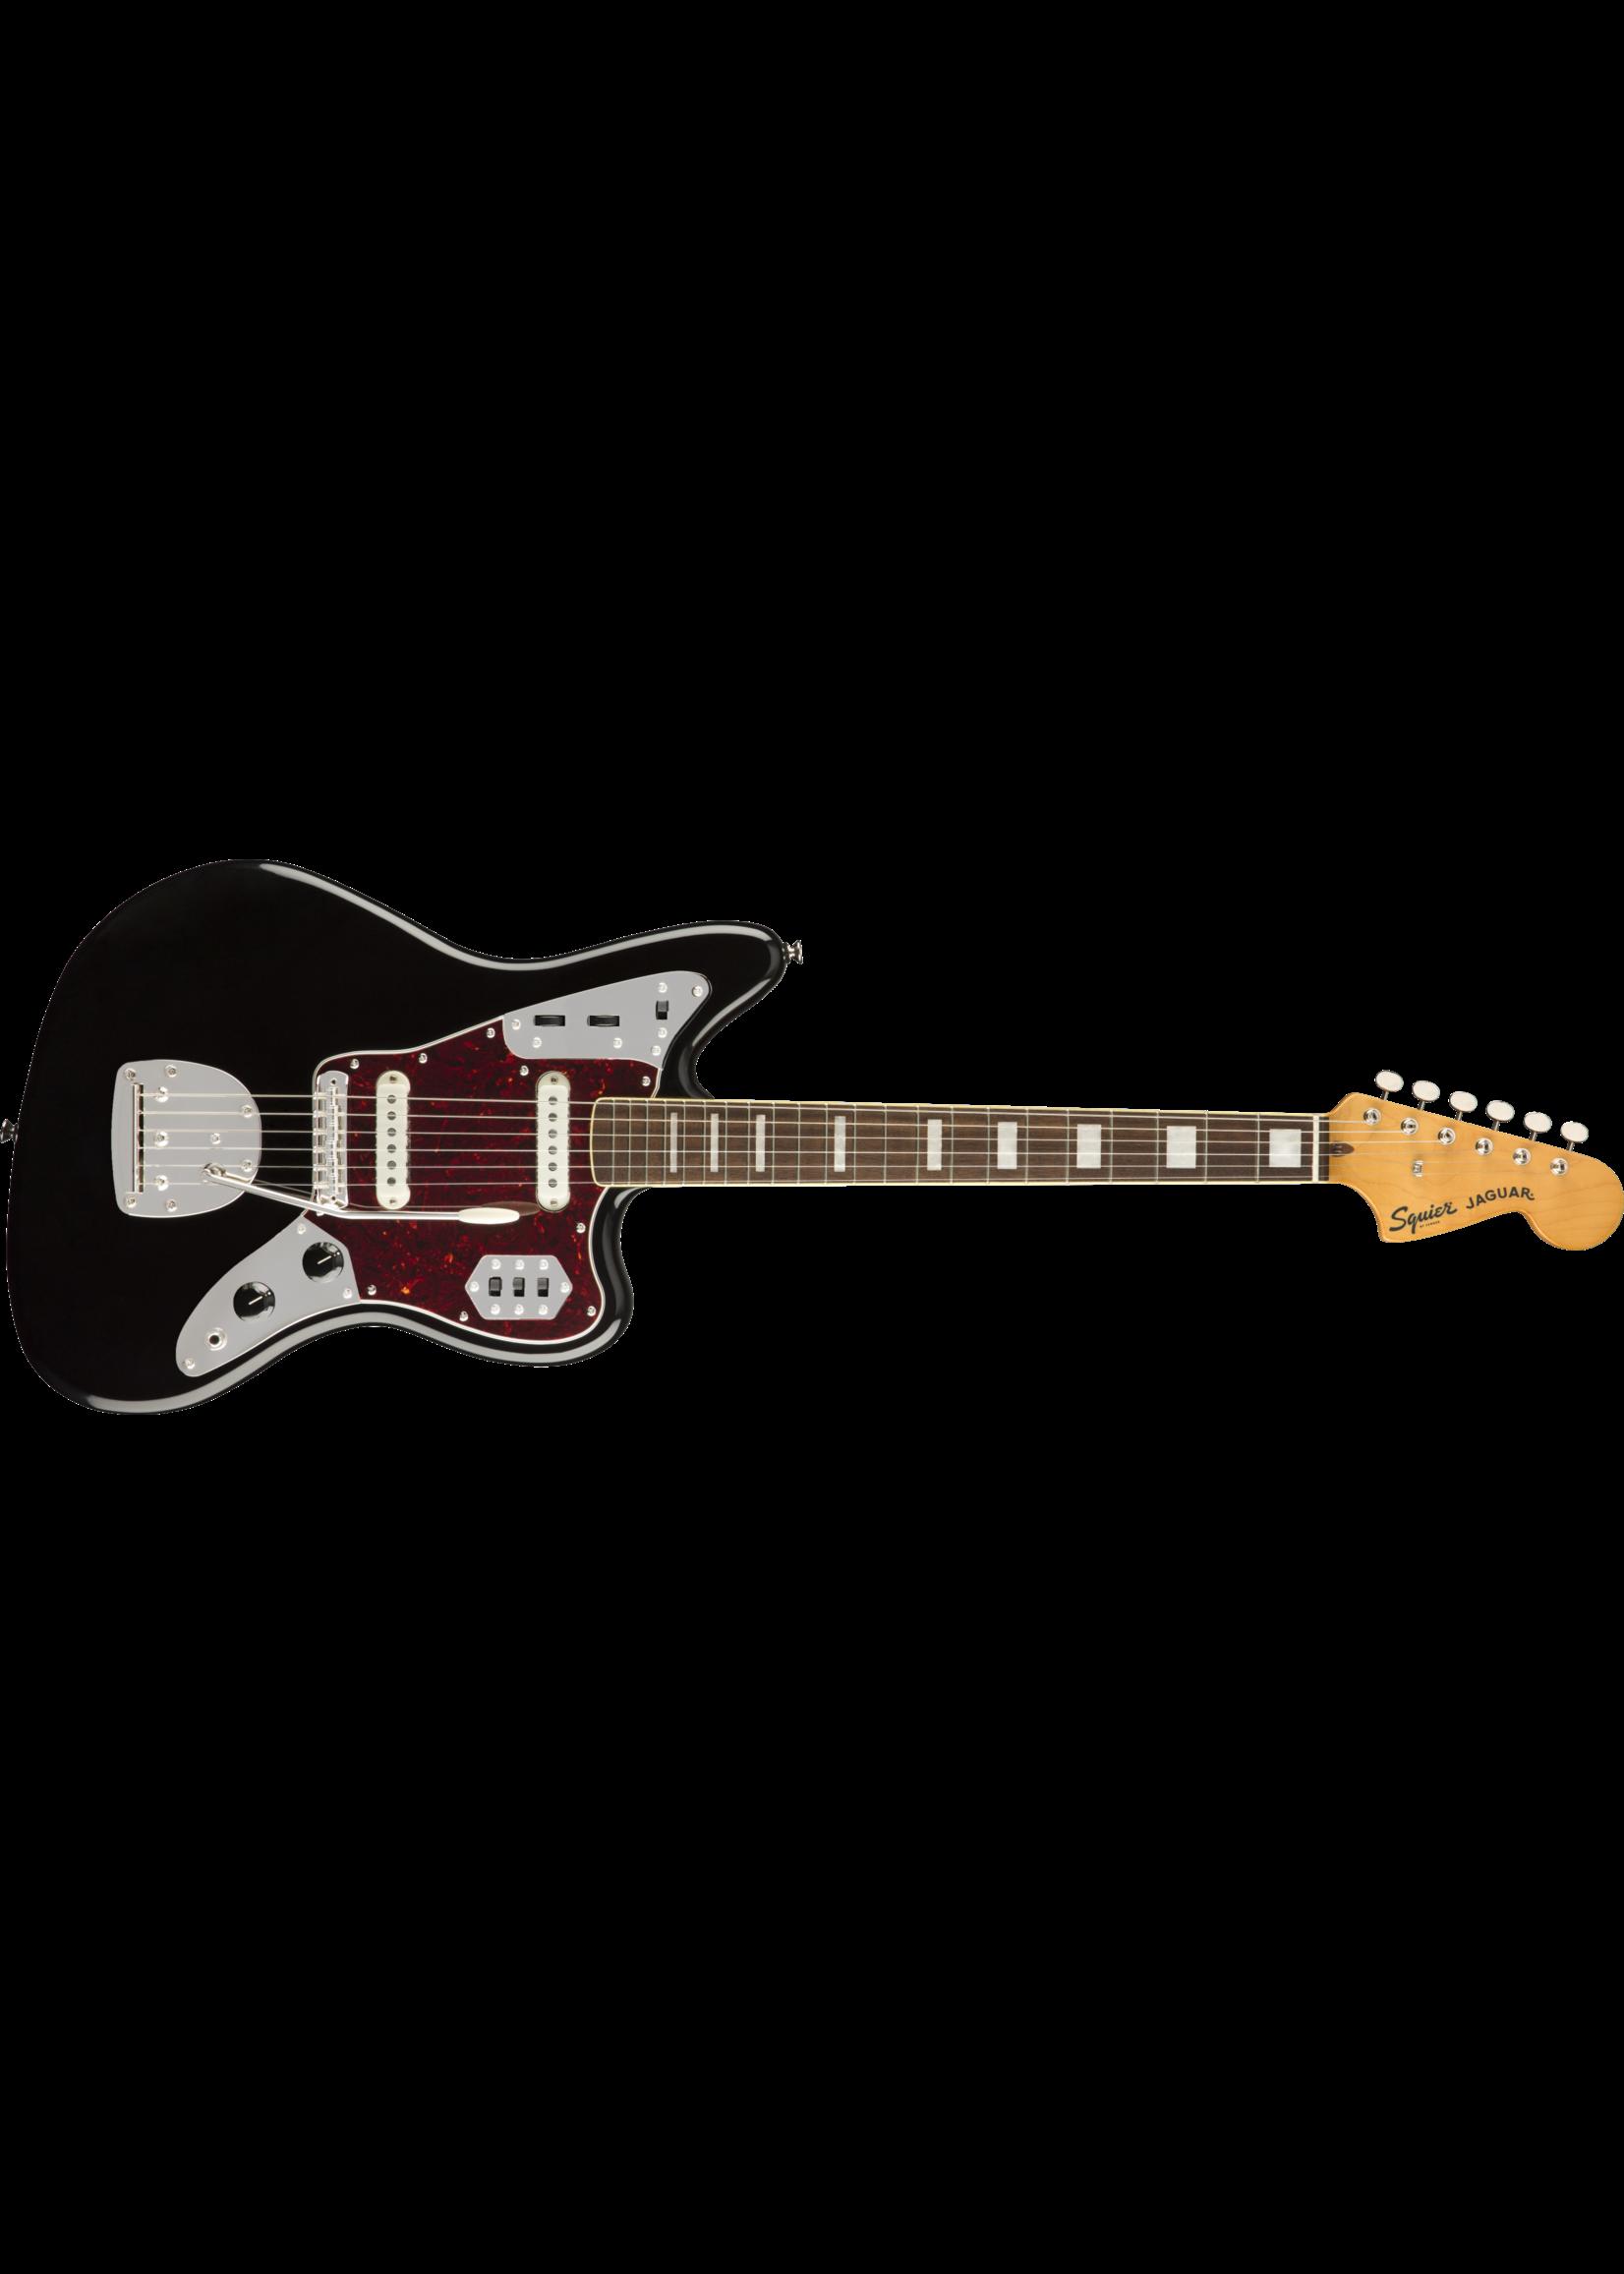 Squier Squier Classic Vibe '70s Jaguar LRL Laurel Fingerboard Black